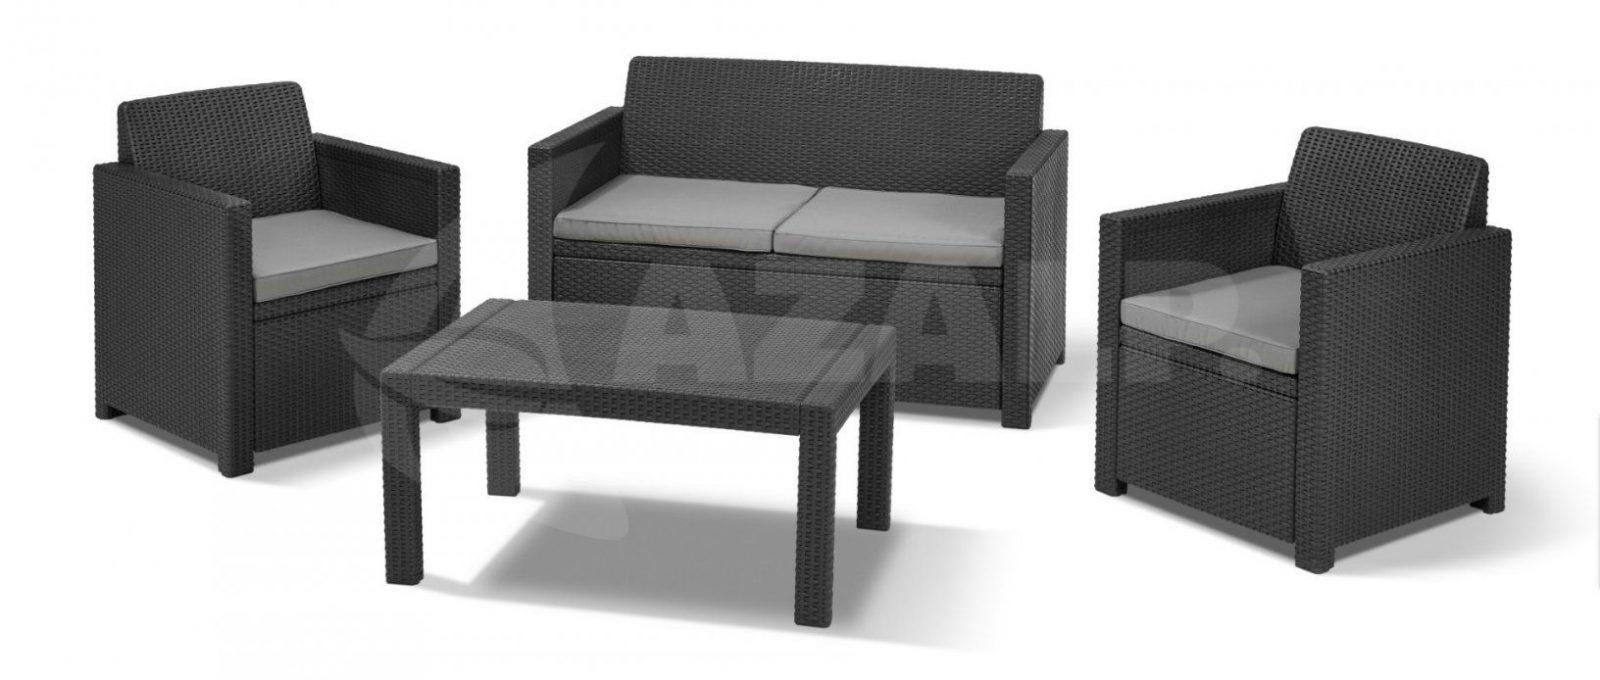 Allibert Merano Lounge Set Graphite Kopen Bij Azalpnl von Allibert Lounge Set Merano Photo